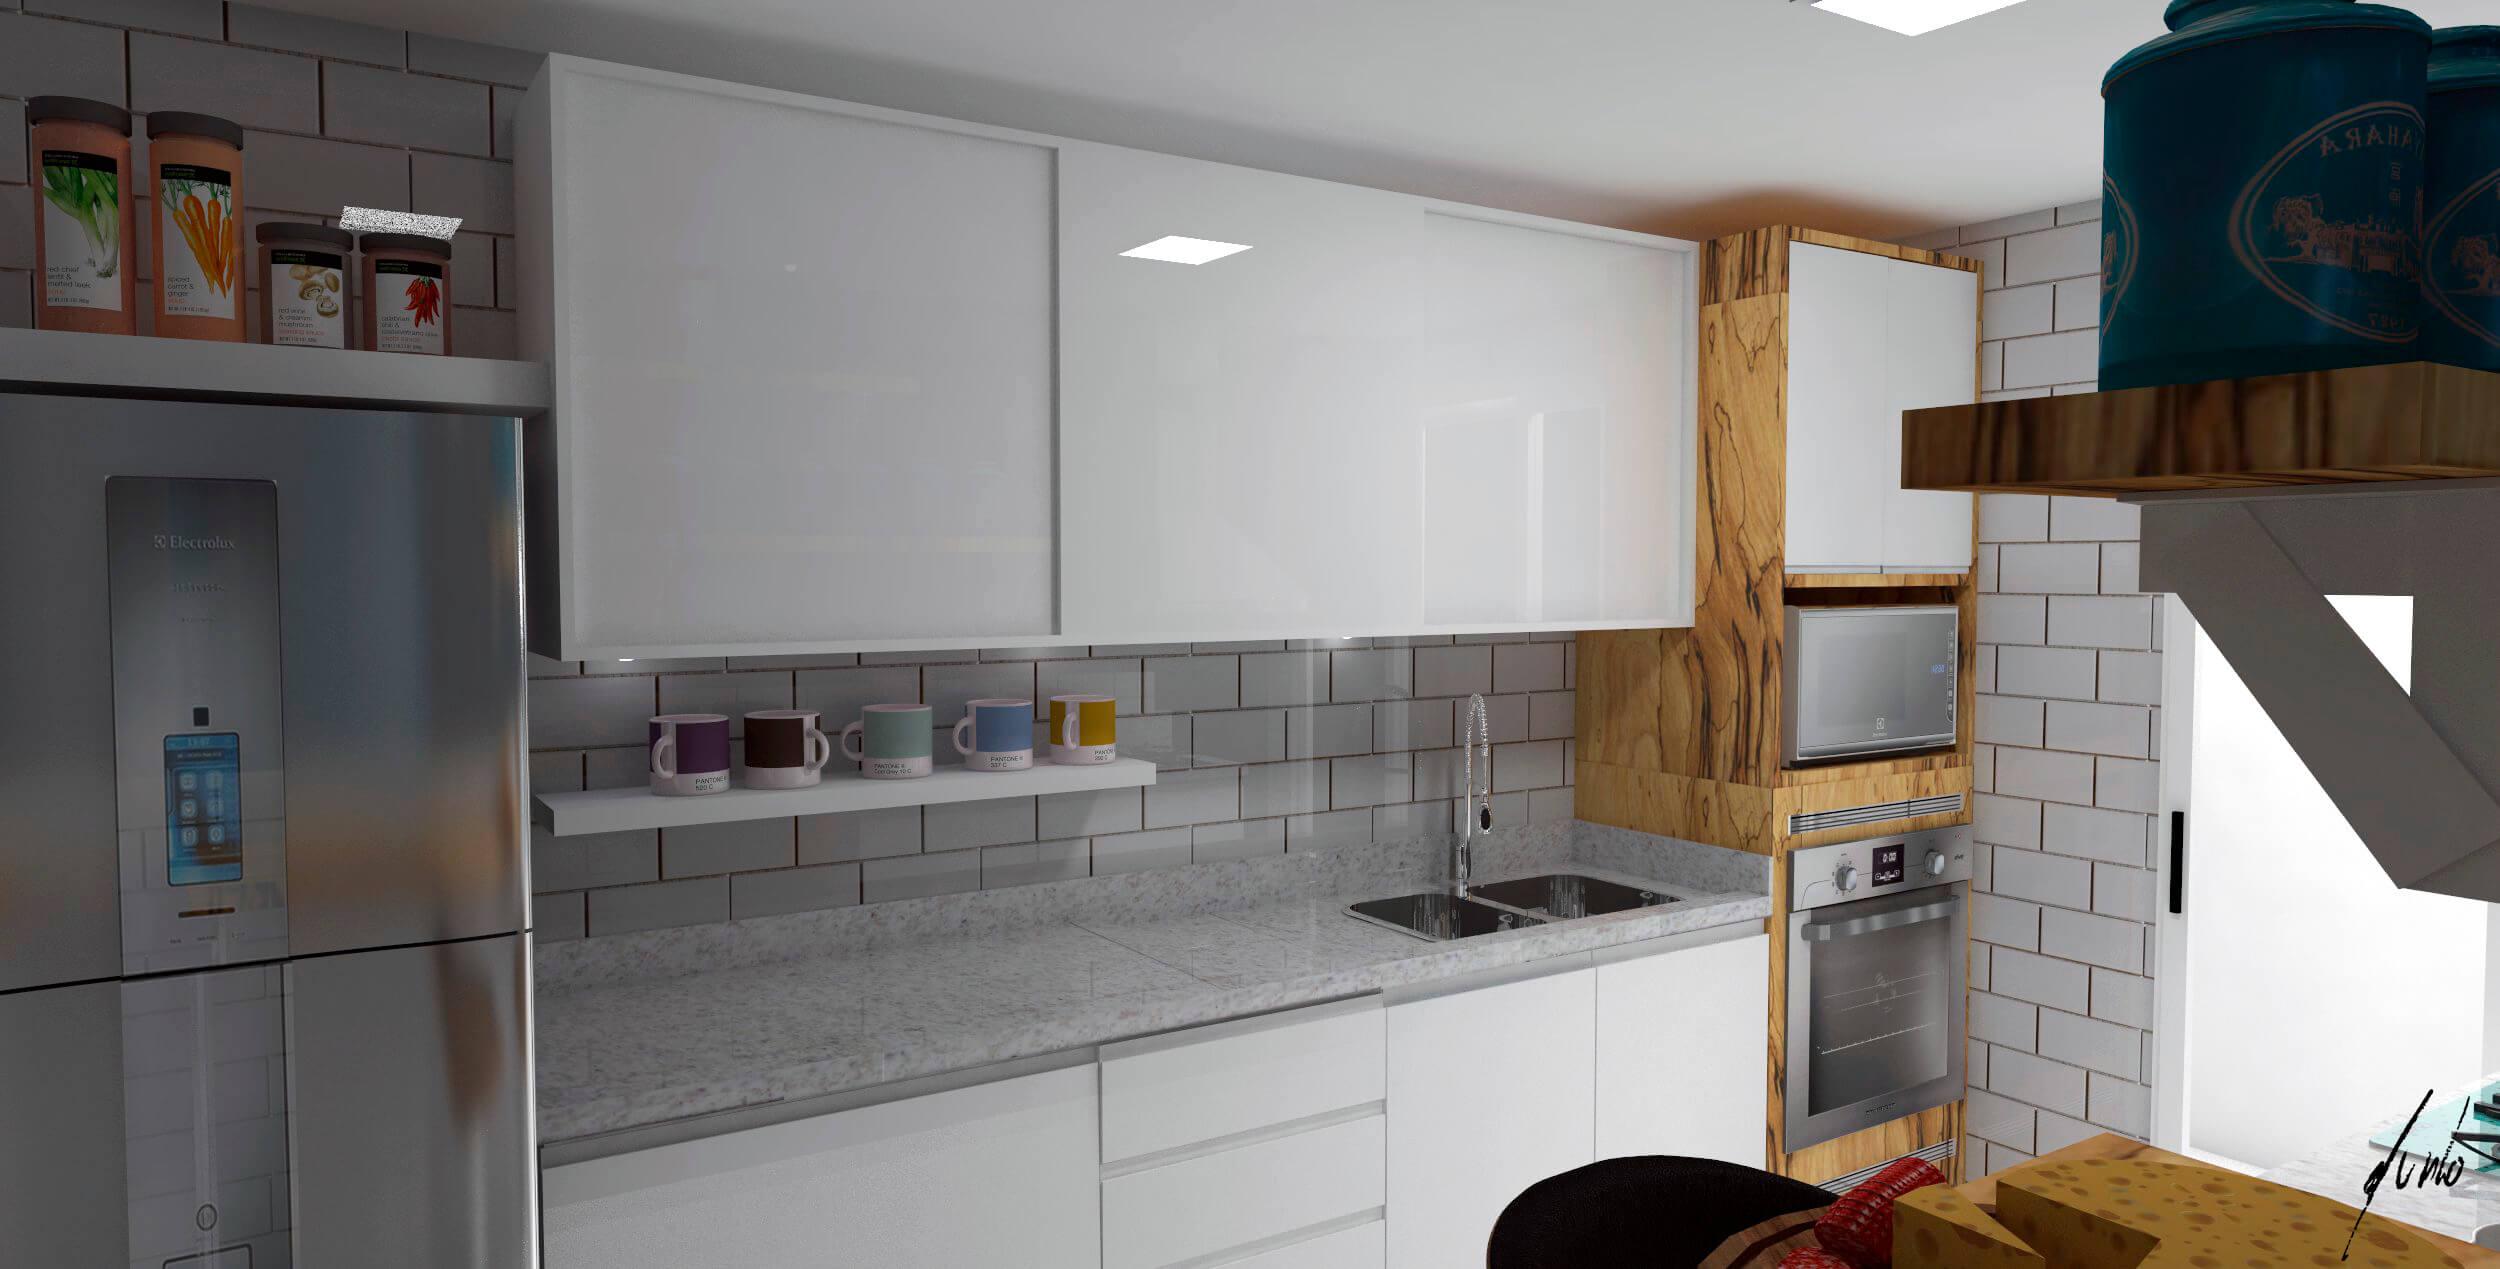 projeto por Murilo Zadulski Designer de interiores em curitiba img13 #876339 2500 1269